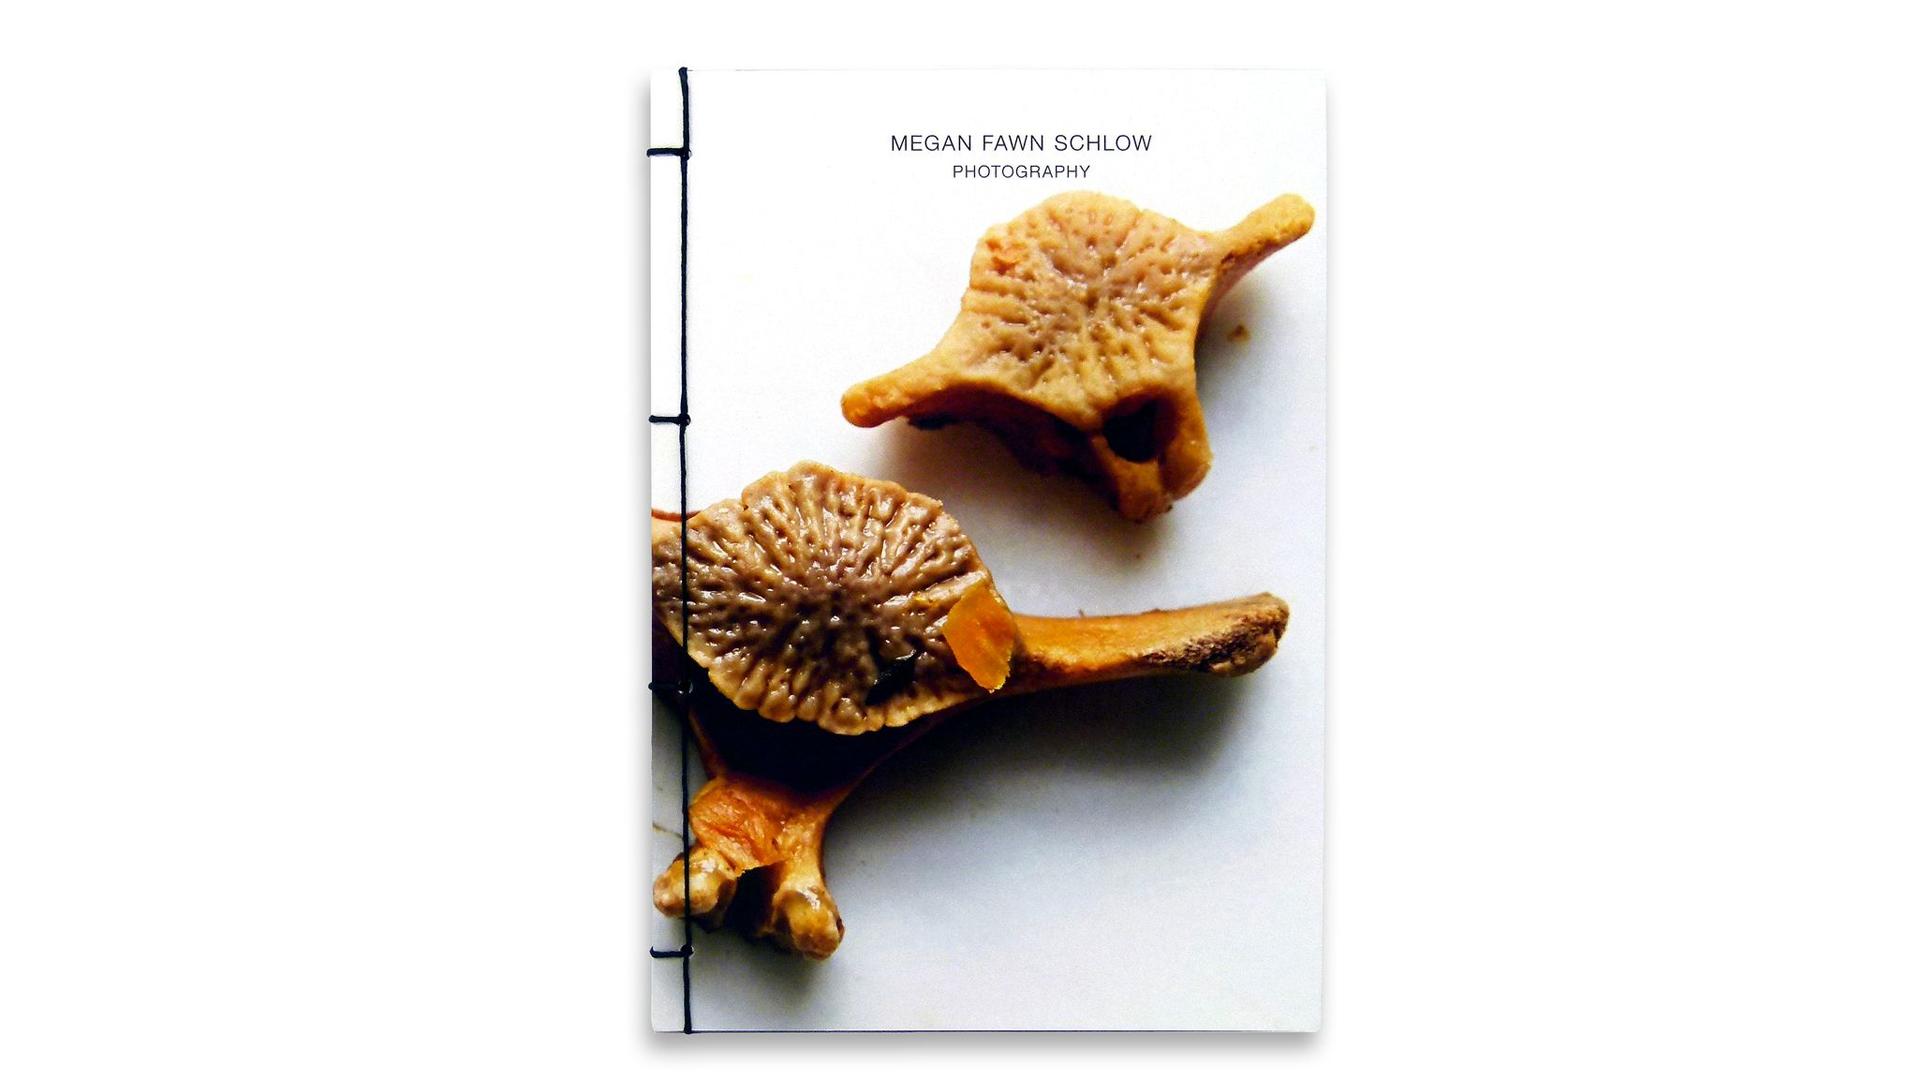 Japanese Stab Binding: Megan Fawn Schlow Photo Book - PaperSpecs